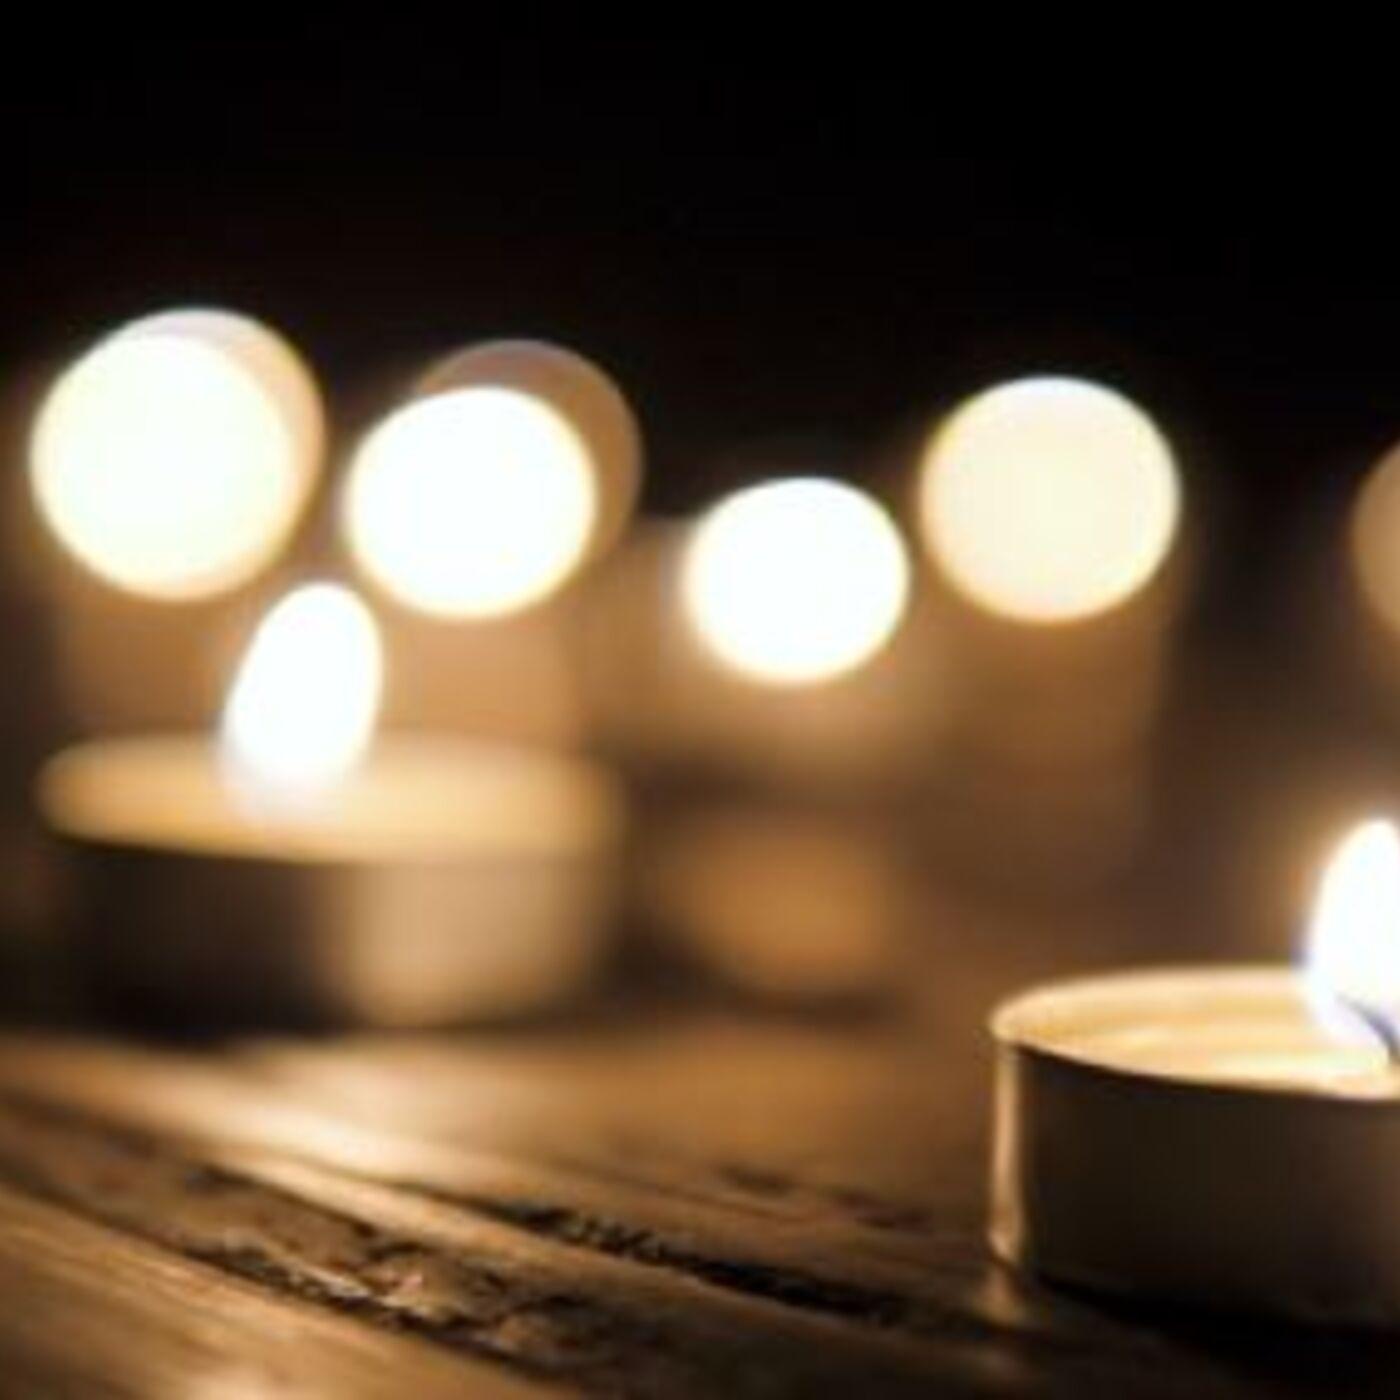 November 29 - Advent 2020: Hope and Prophesy